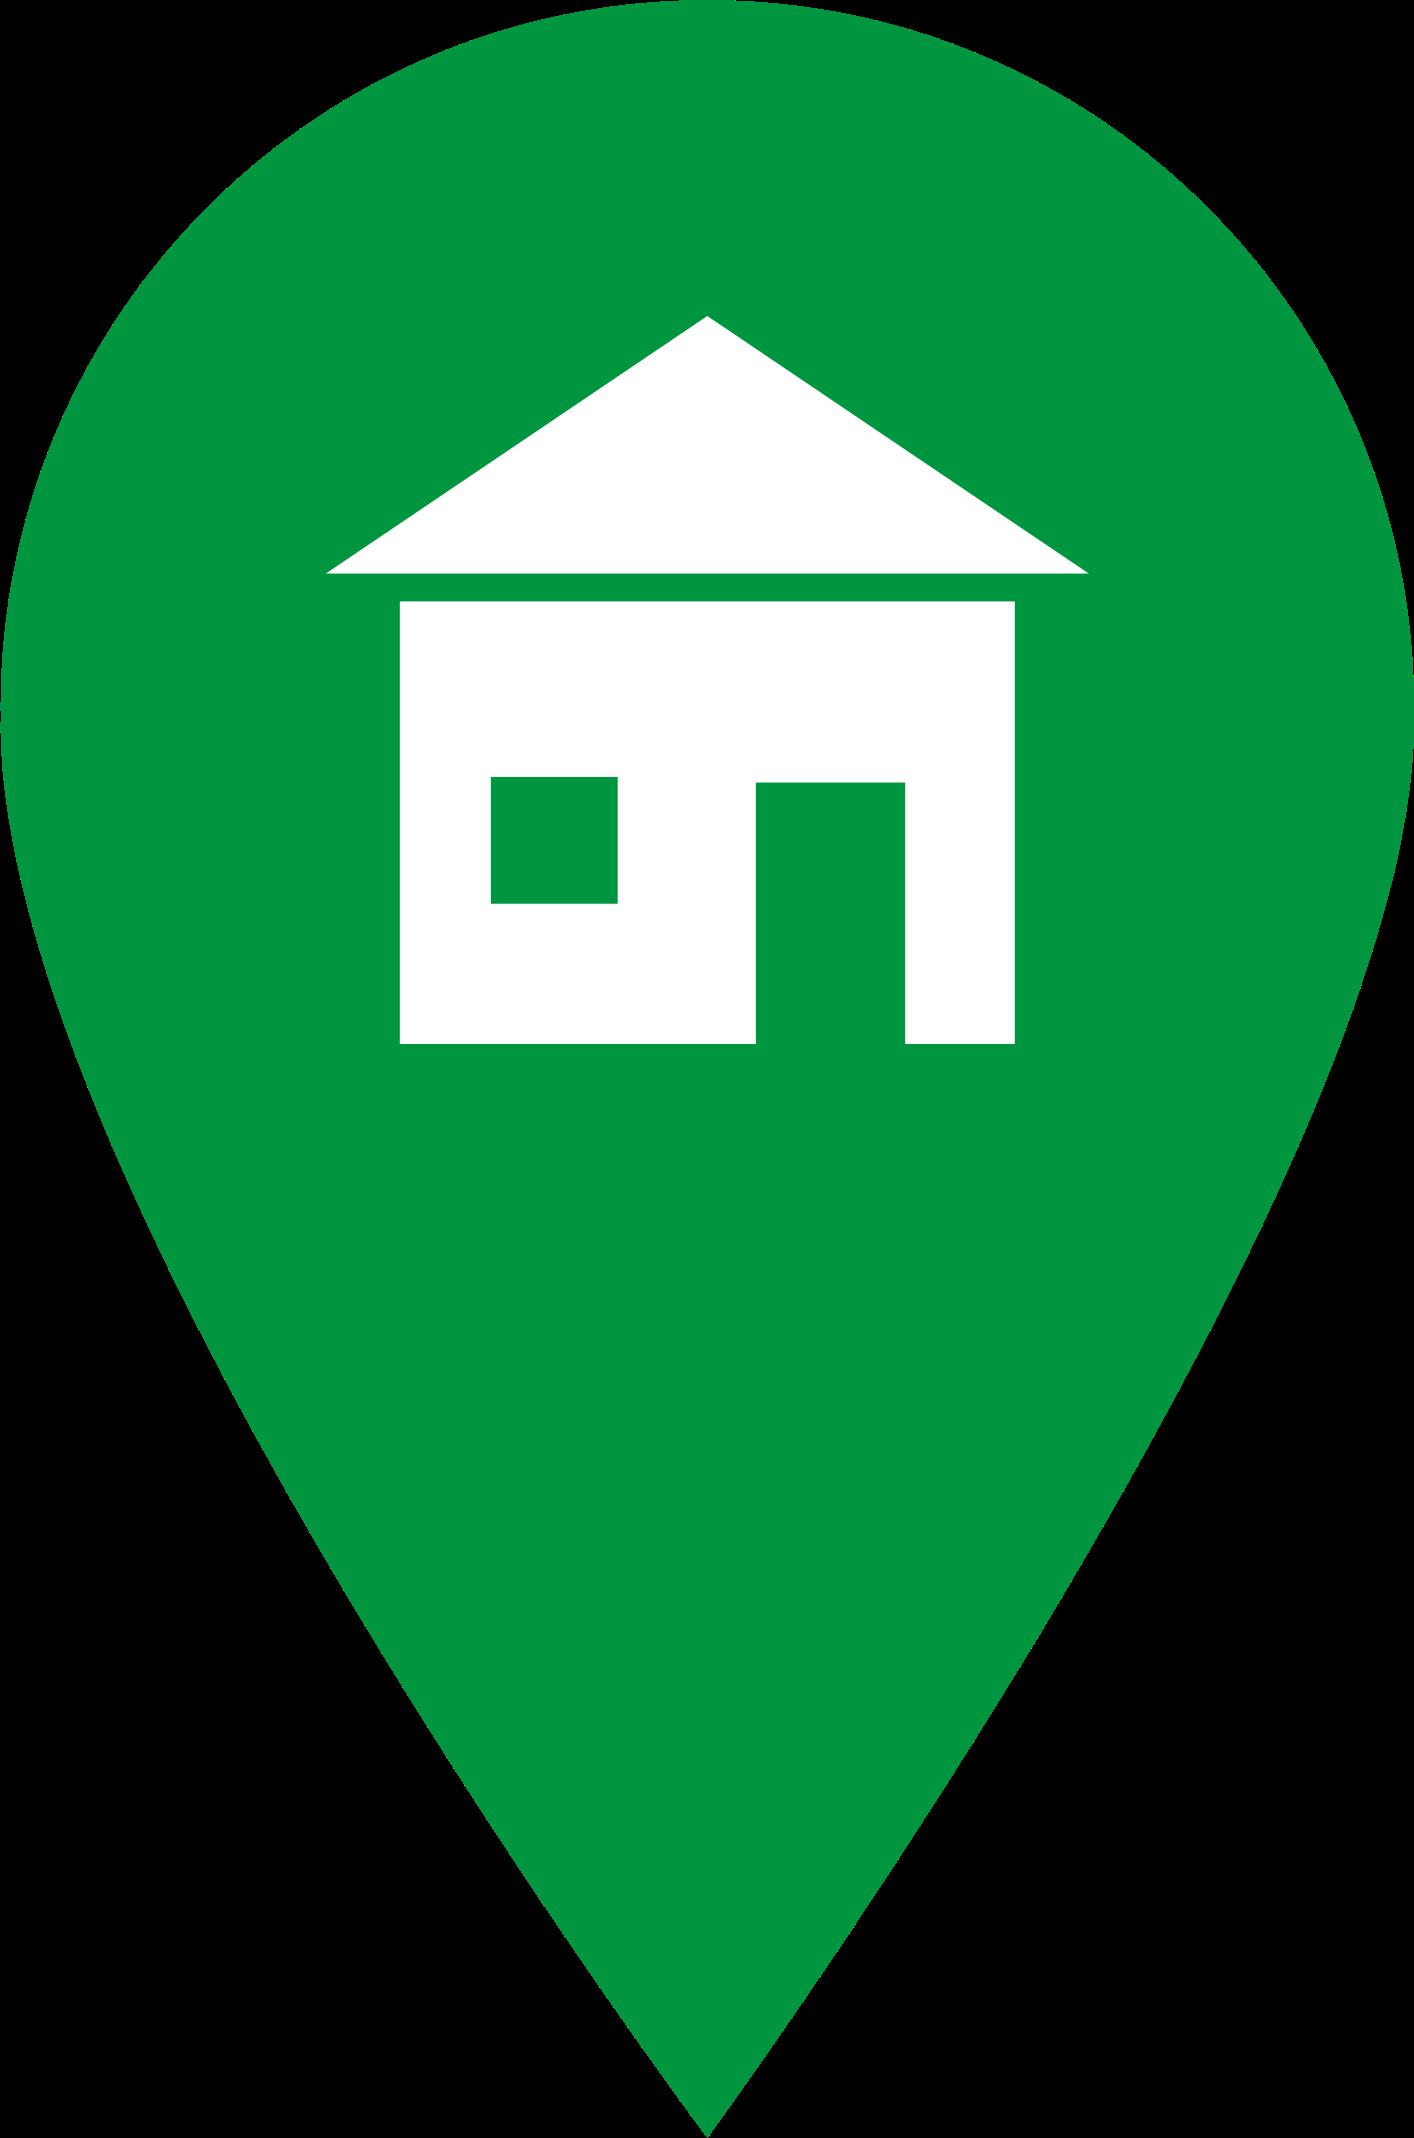 Location clipart green. Home icon big image